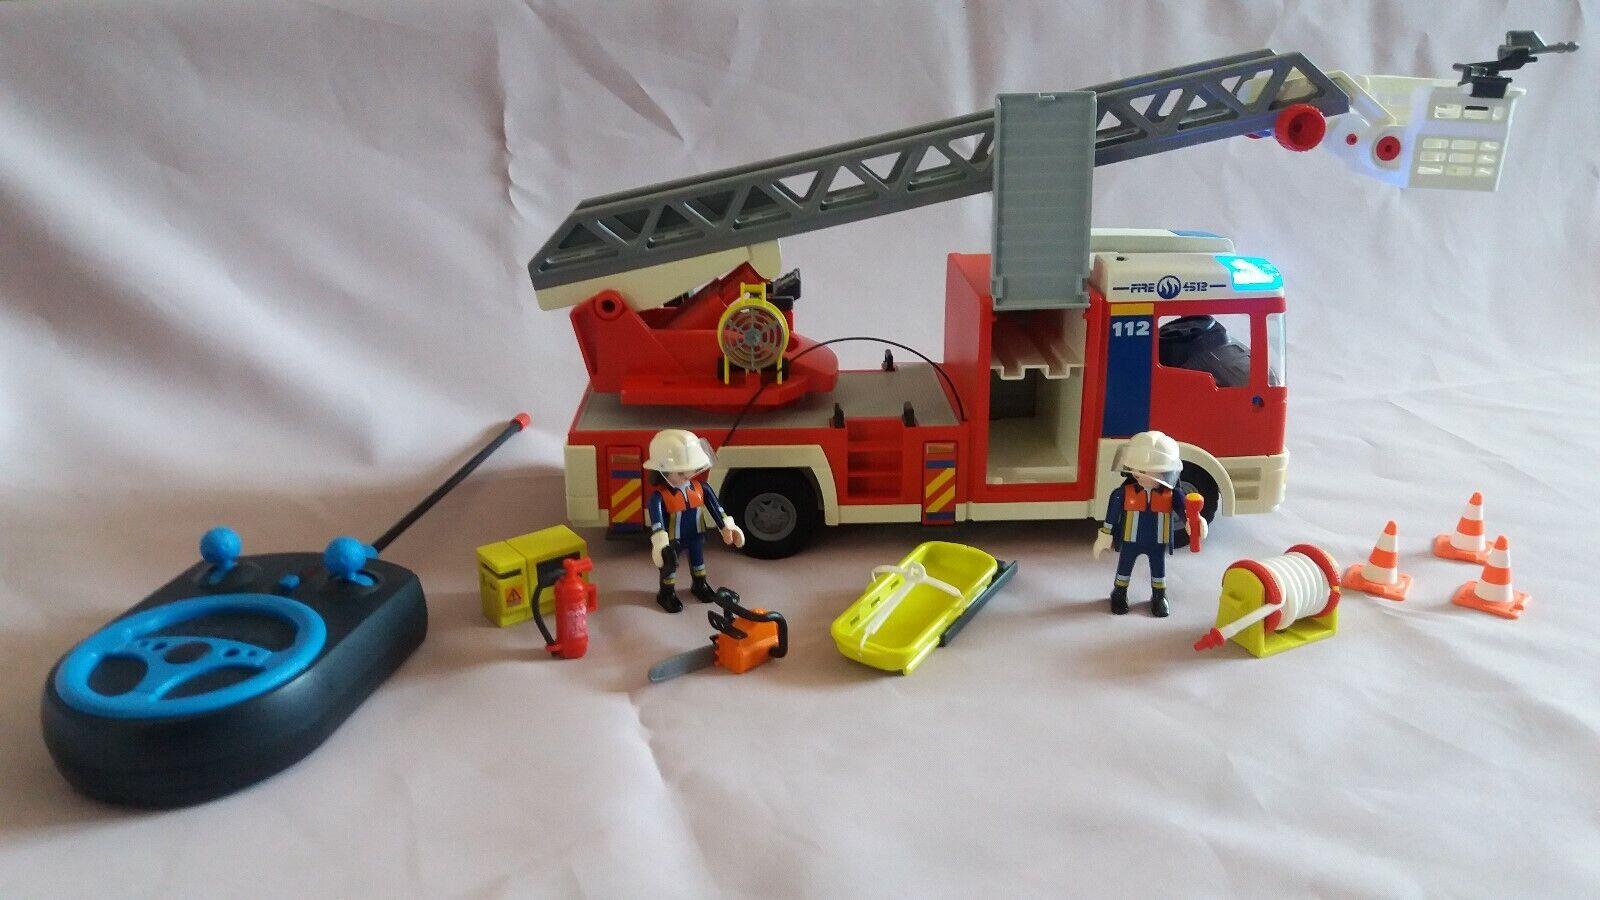 Playmobil Feuerwehrauto 4820 inkl. RC-Modul-Set (mit Fernbedienung)